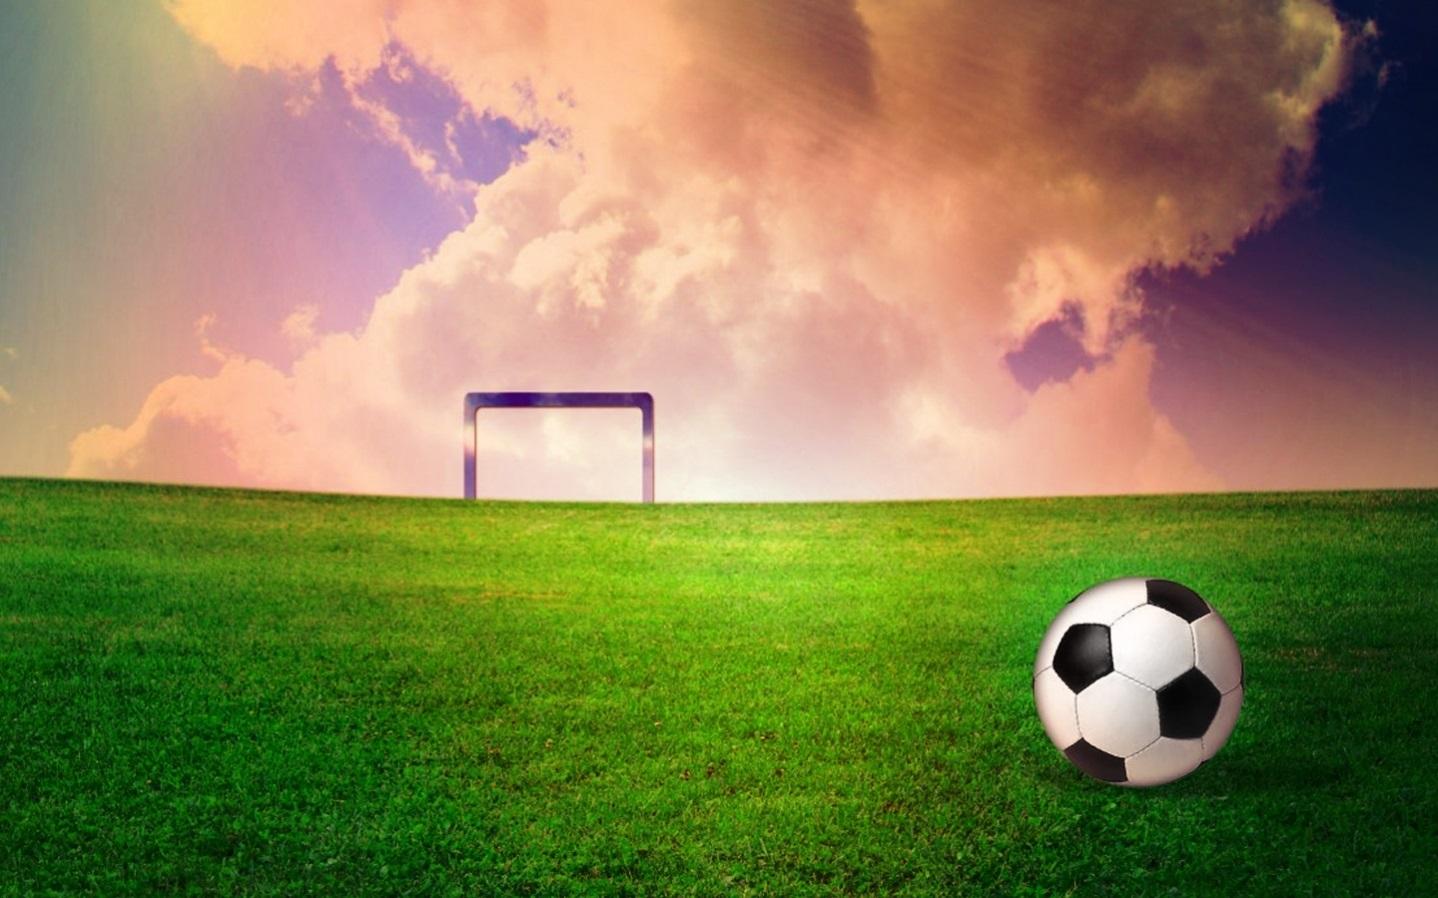 Football Images Football Hd Wallpaper And Background: HD Football Field Wallpaper